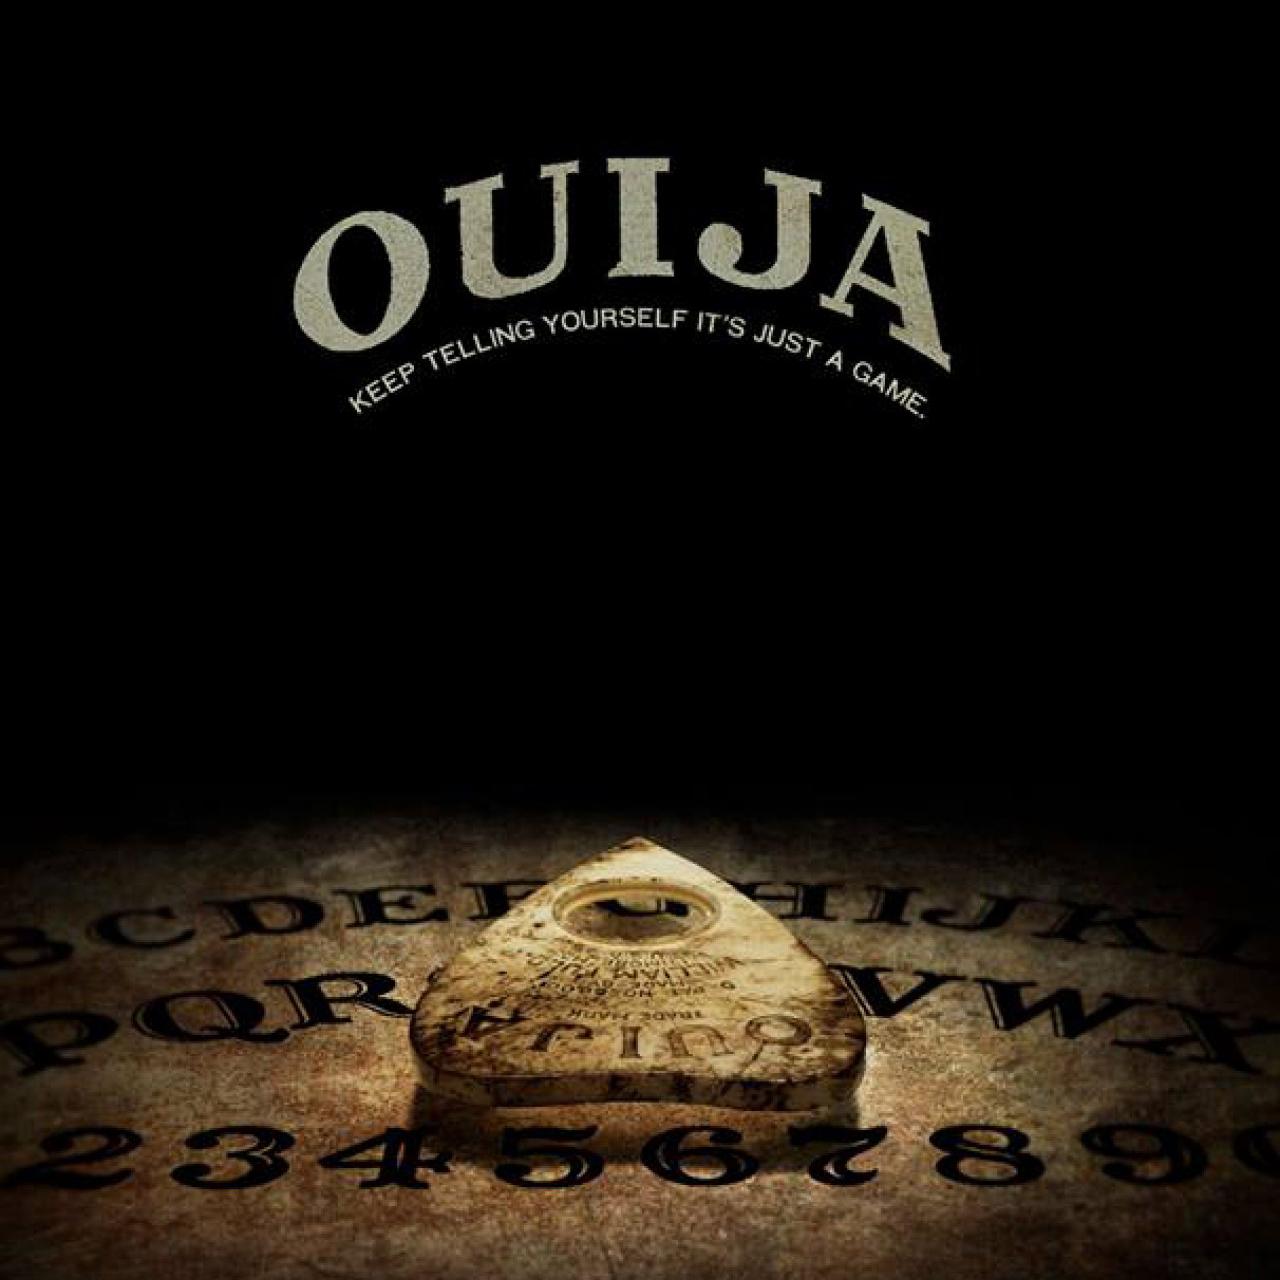 Ouija_home thumbnail.jpg